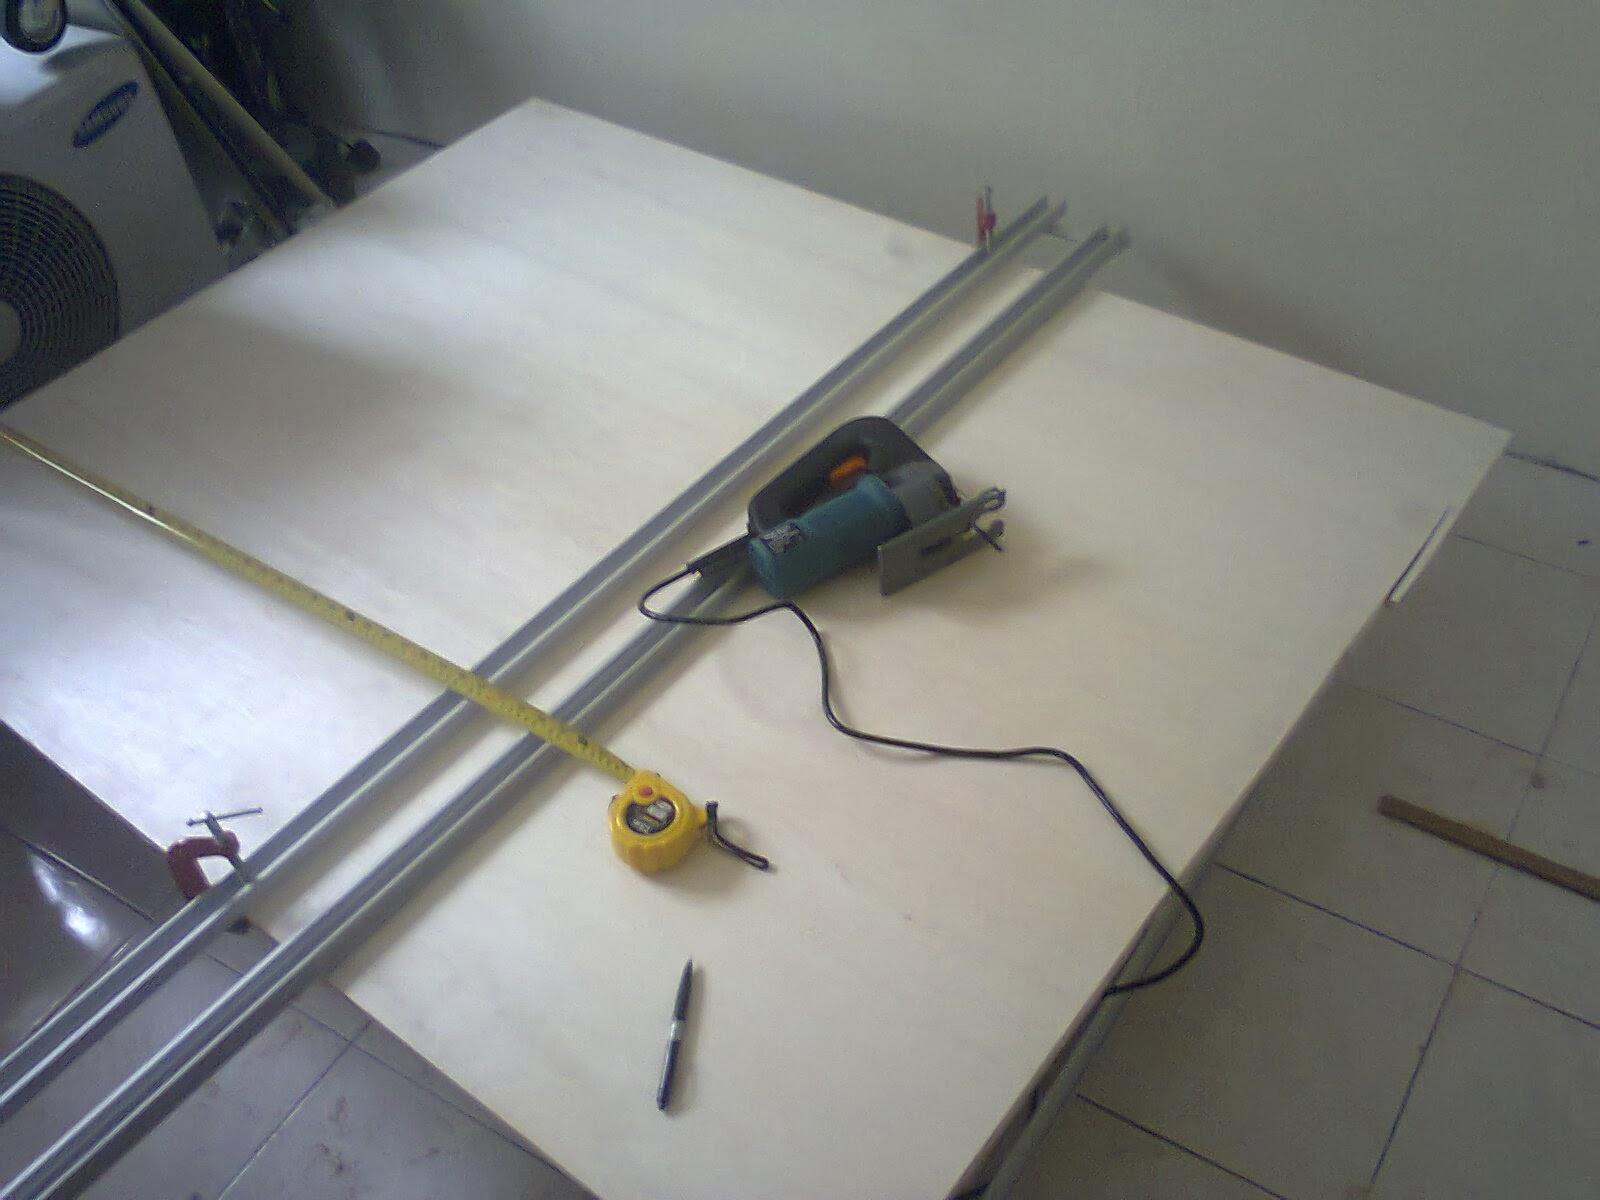 Cara Memotong Papan Dengan Lurus Gergaji Pun Guna Cap China Jer Tahan Sampai Sekarang Dinding Tepi Kabinet Dapur